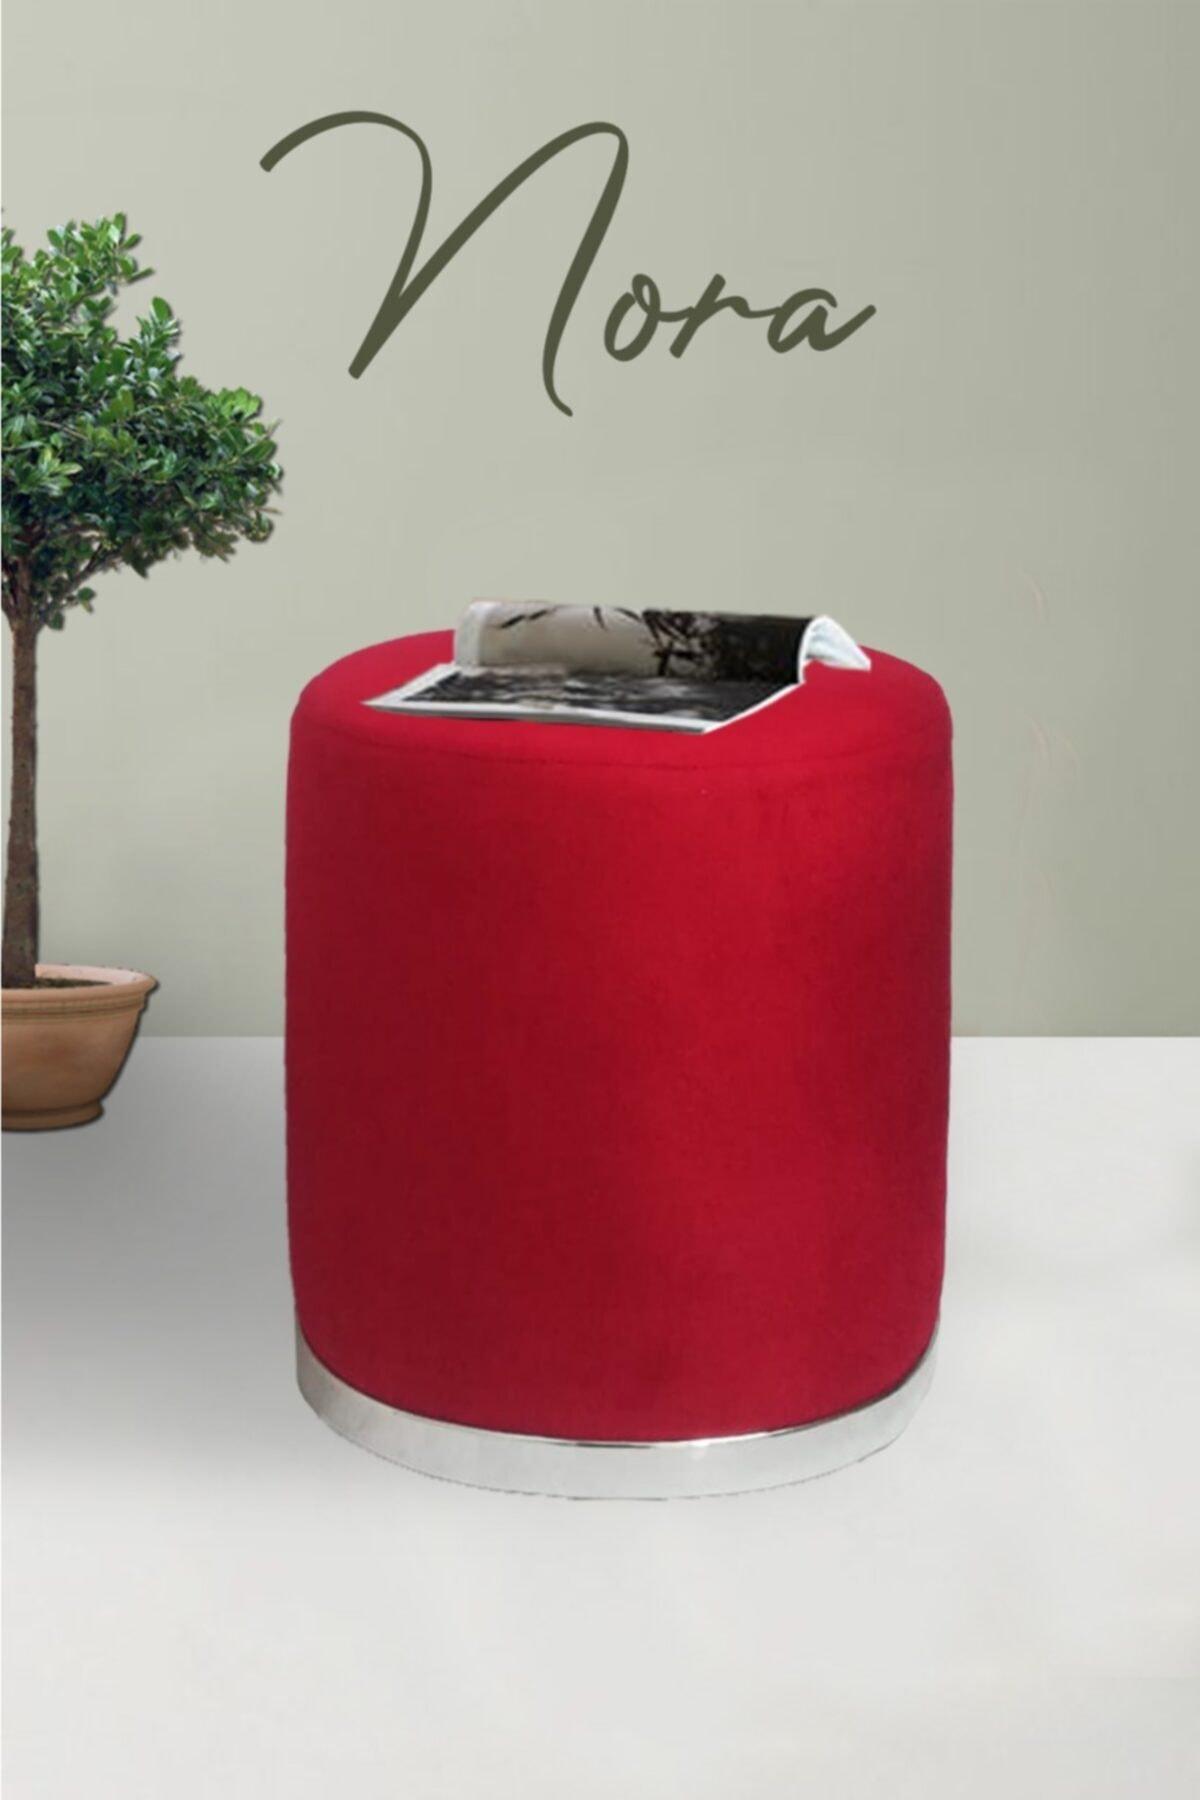 Zem Nora Silinebilir Puf - Red Silver 1